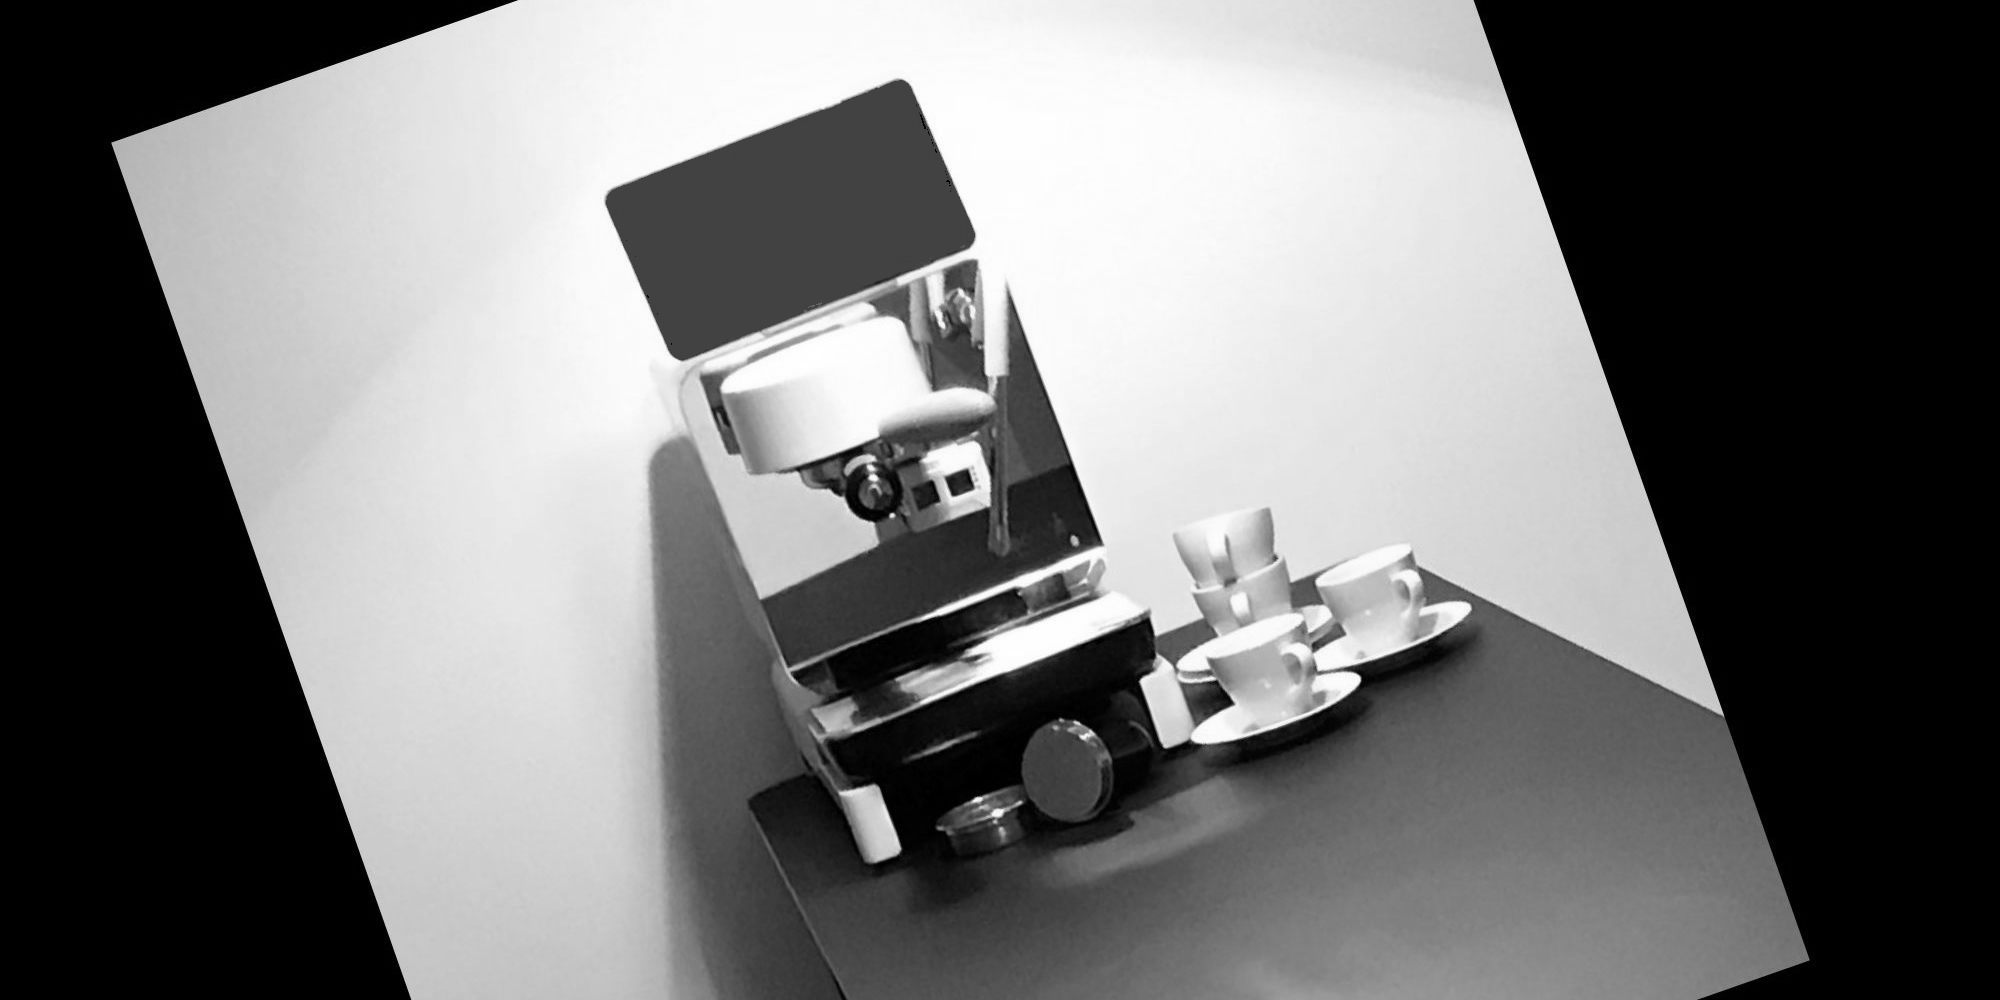 Espressomaschine-iPhone-Prototype (Bildquelle: Fraunhofer IAO)